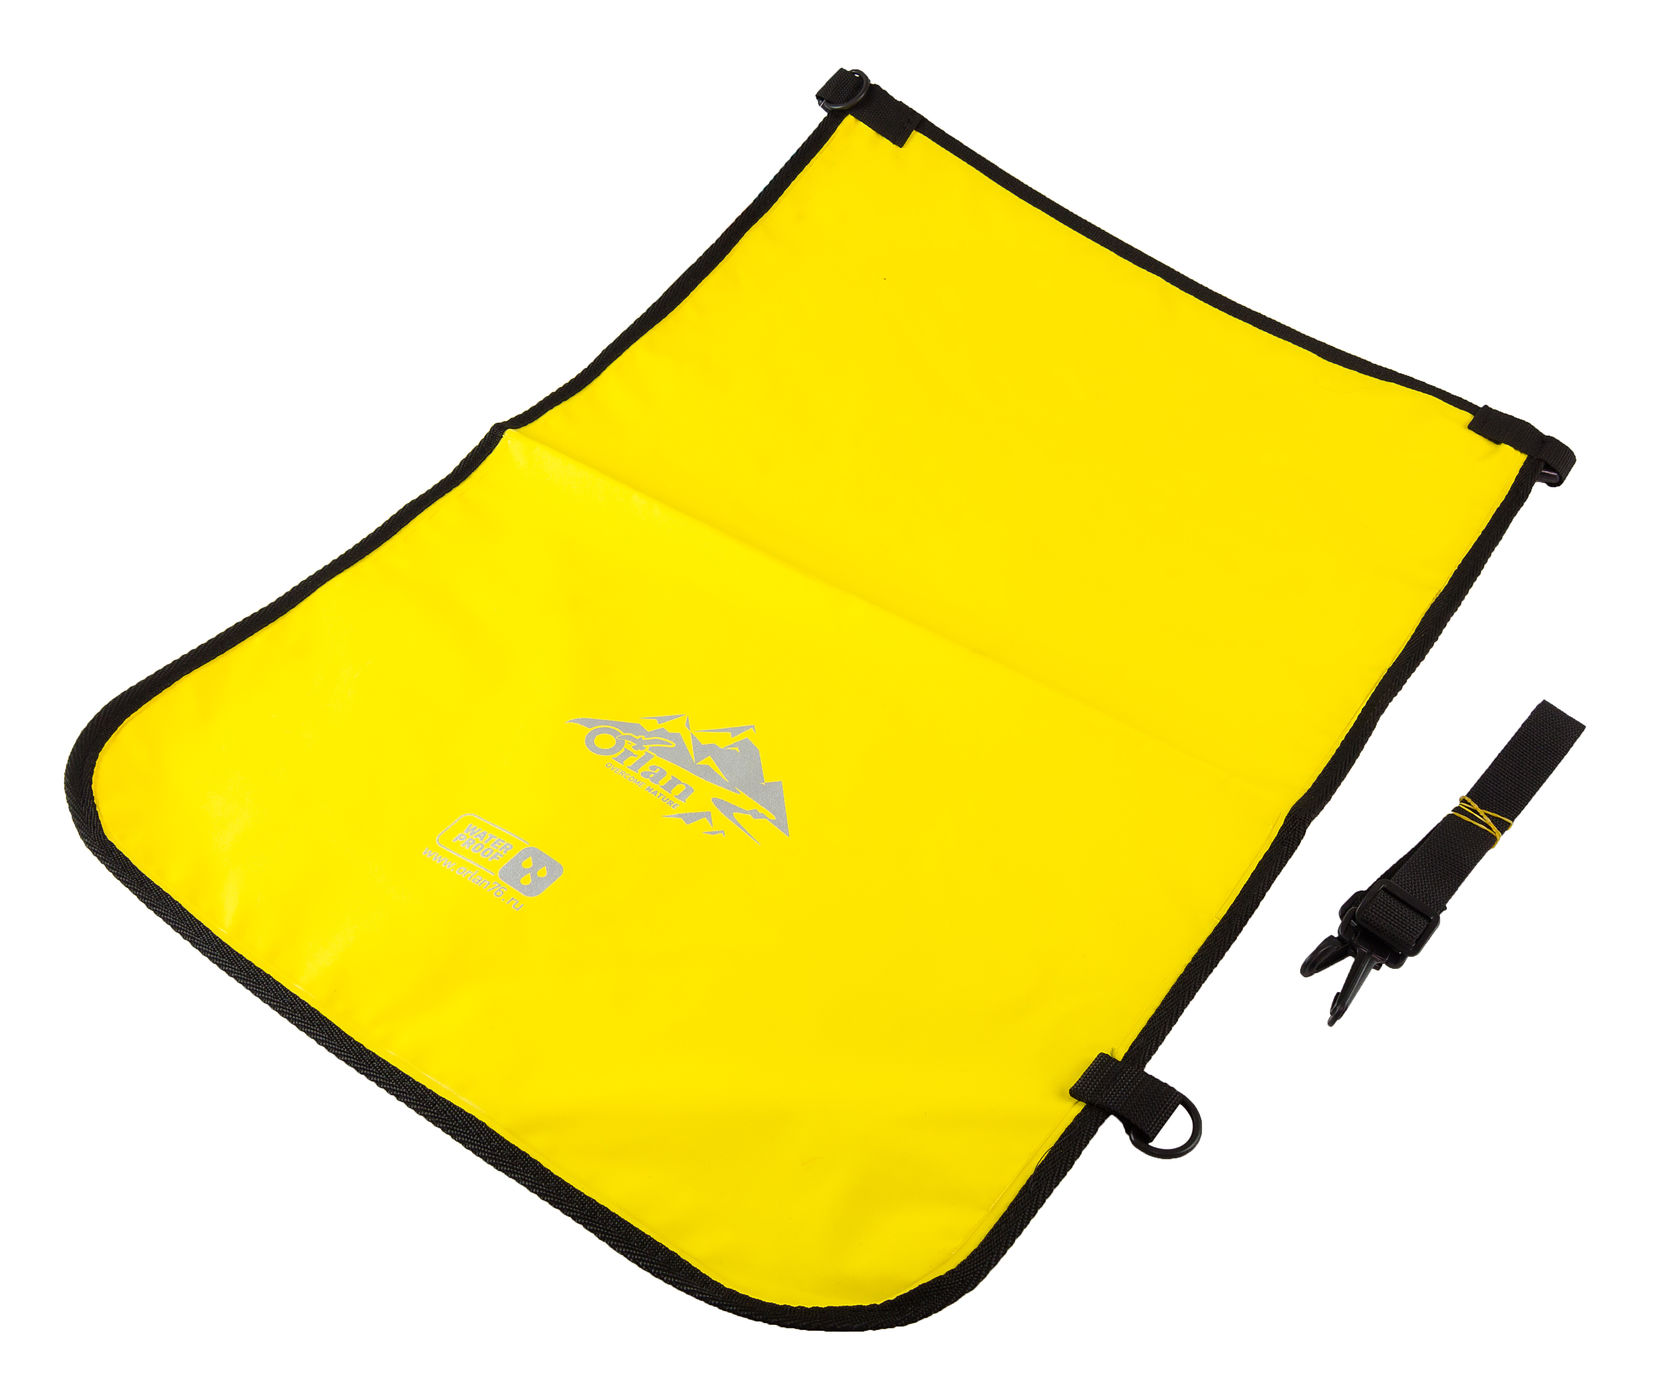 Herrobag compacto de PVC fundido 30 l, amarillo